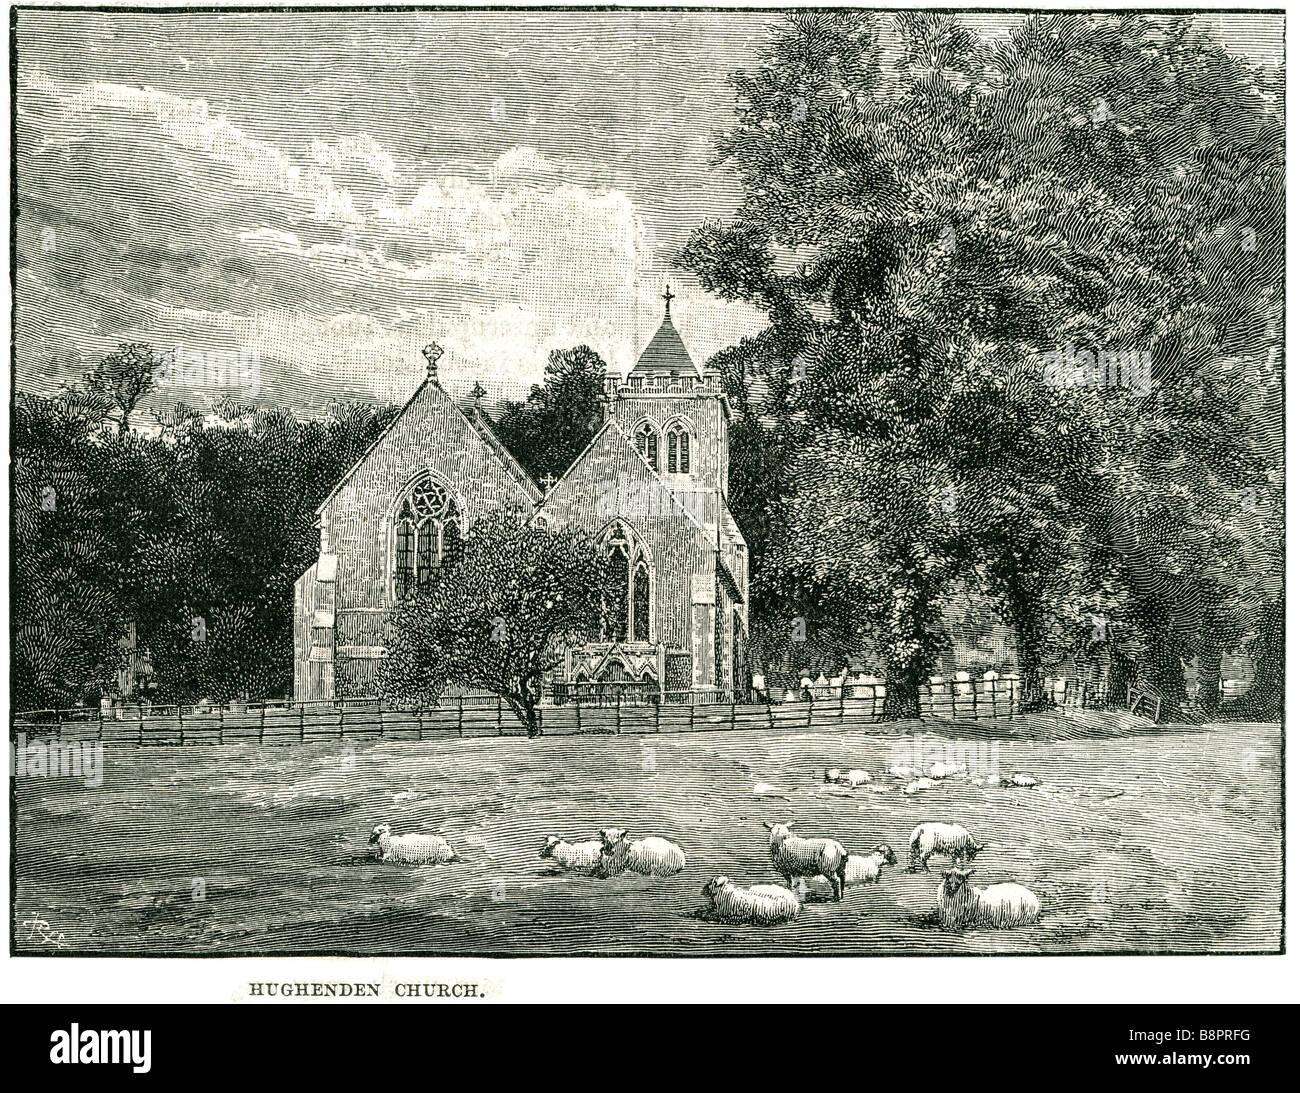 hughenden church 1881 Hitchendon Wycombe district Buckinghamshire England Stock Photo